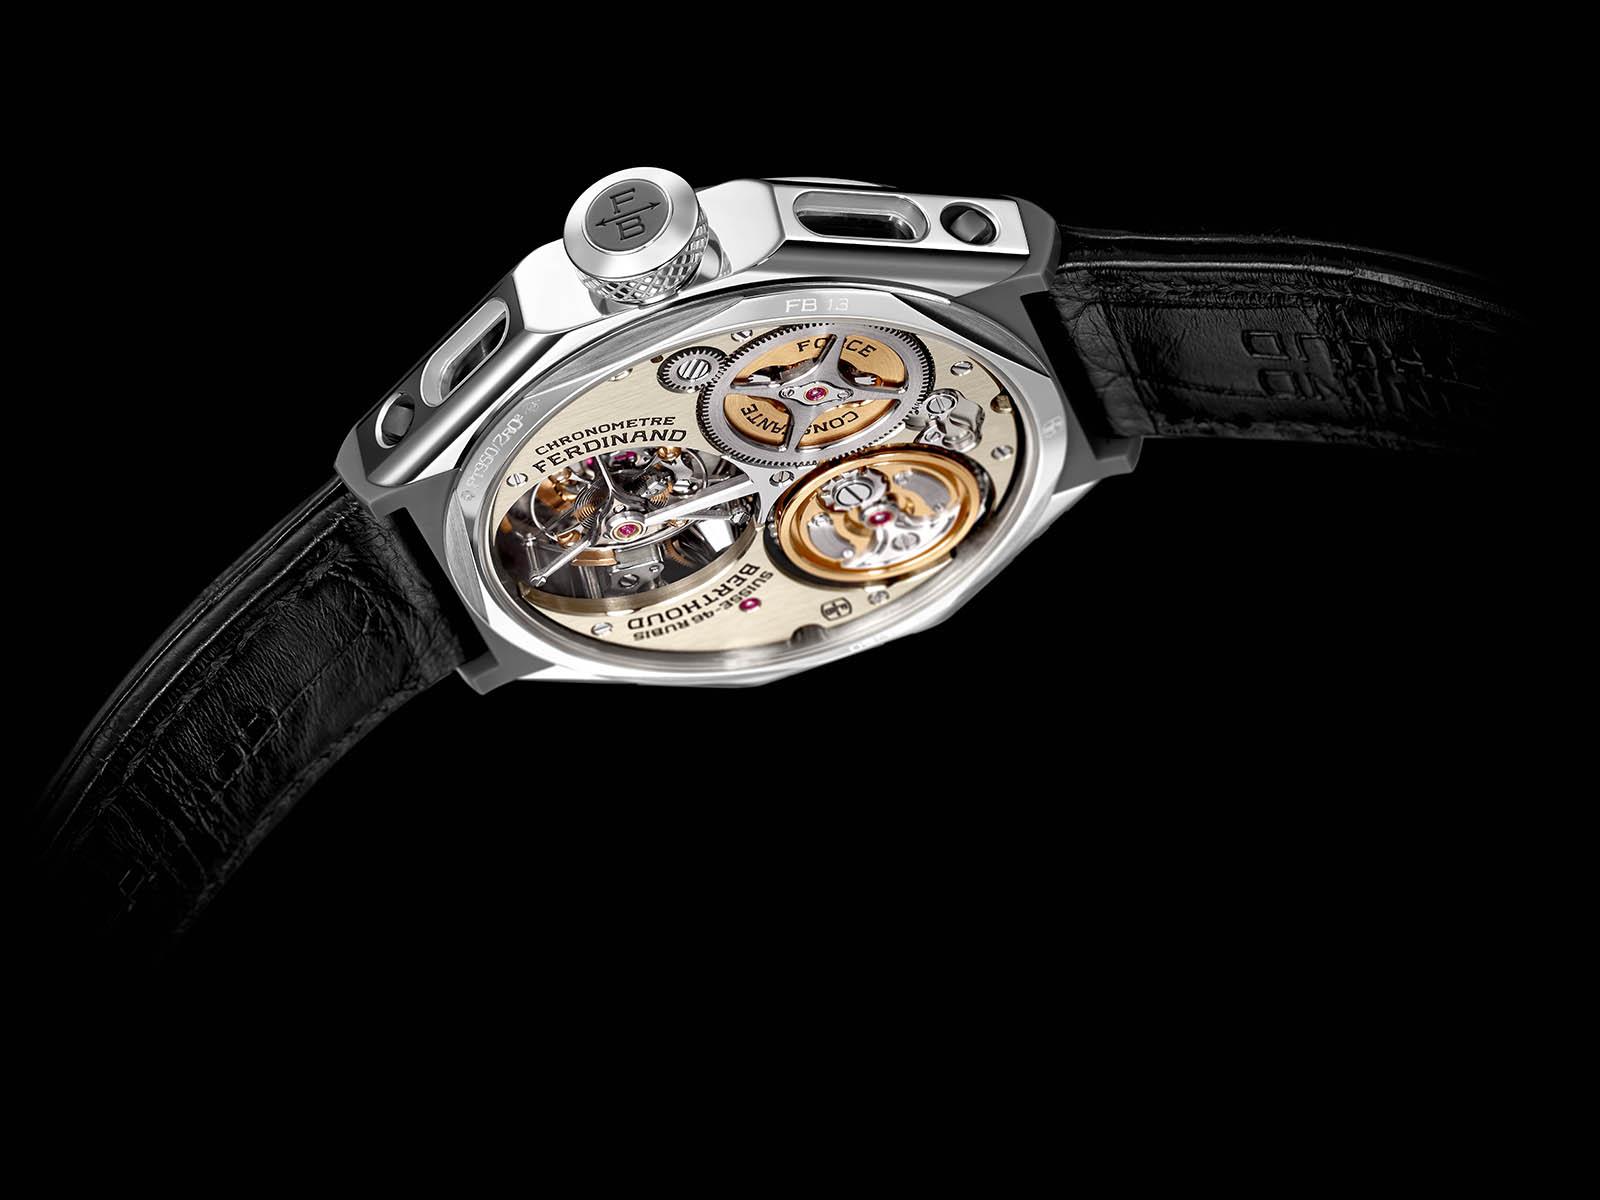 Chronometrie-Ferdinand-Berthoud-FB-1-3-2.jpg